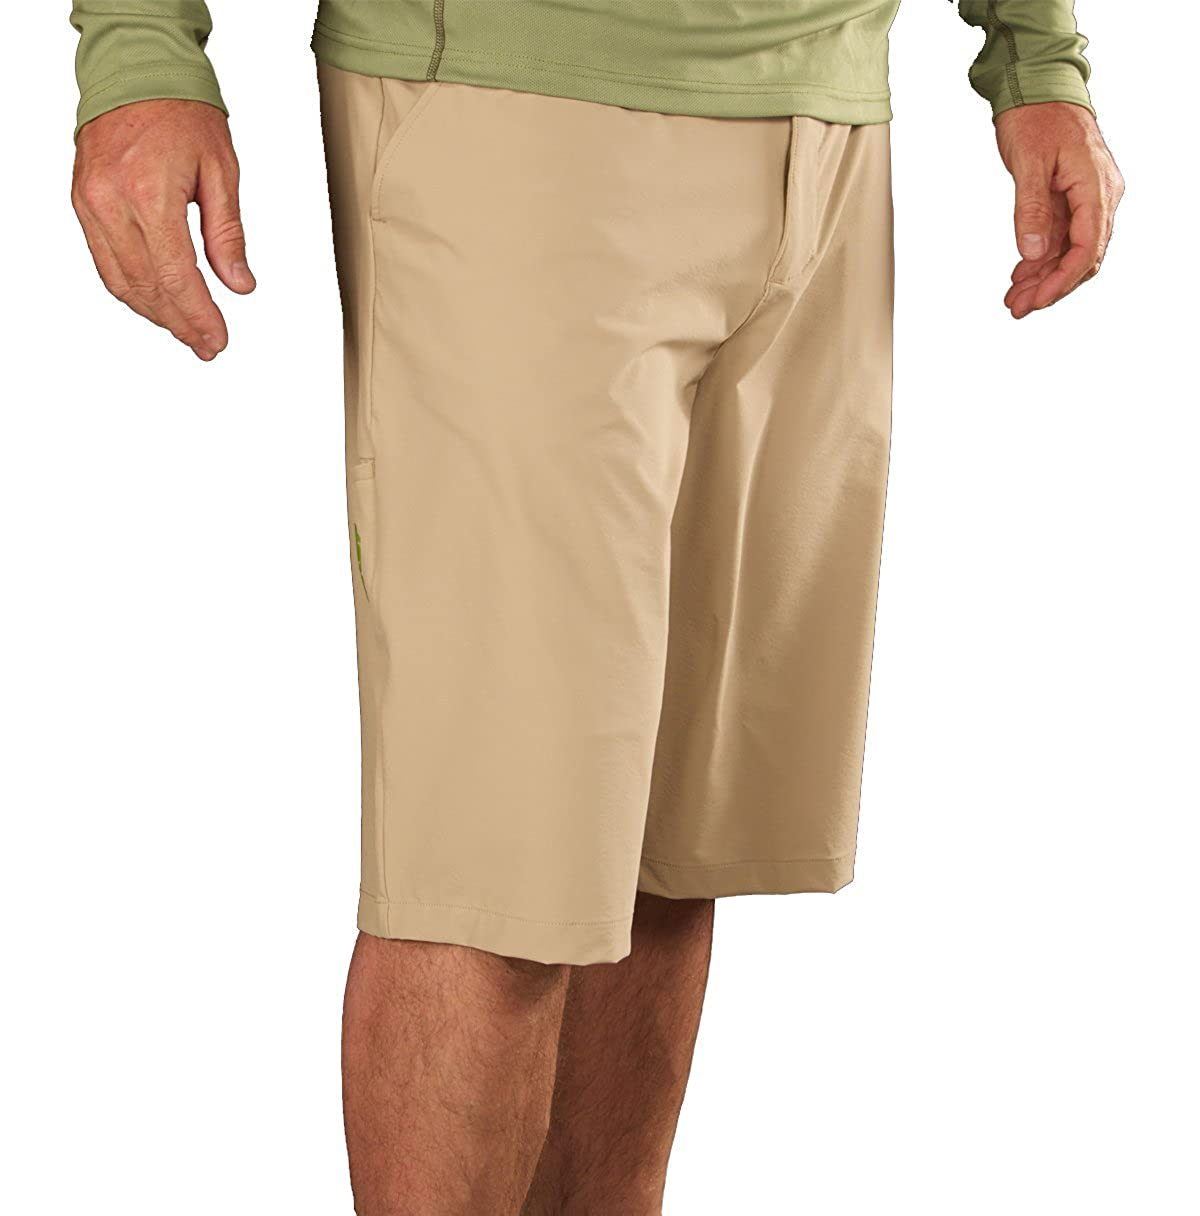 KAST Gear Tailspin Guide Short Khaki X-Large